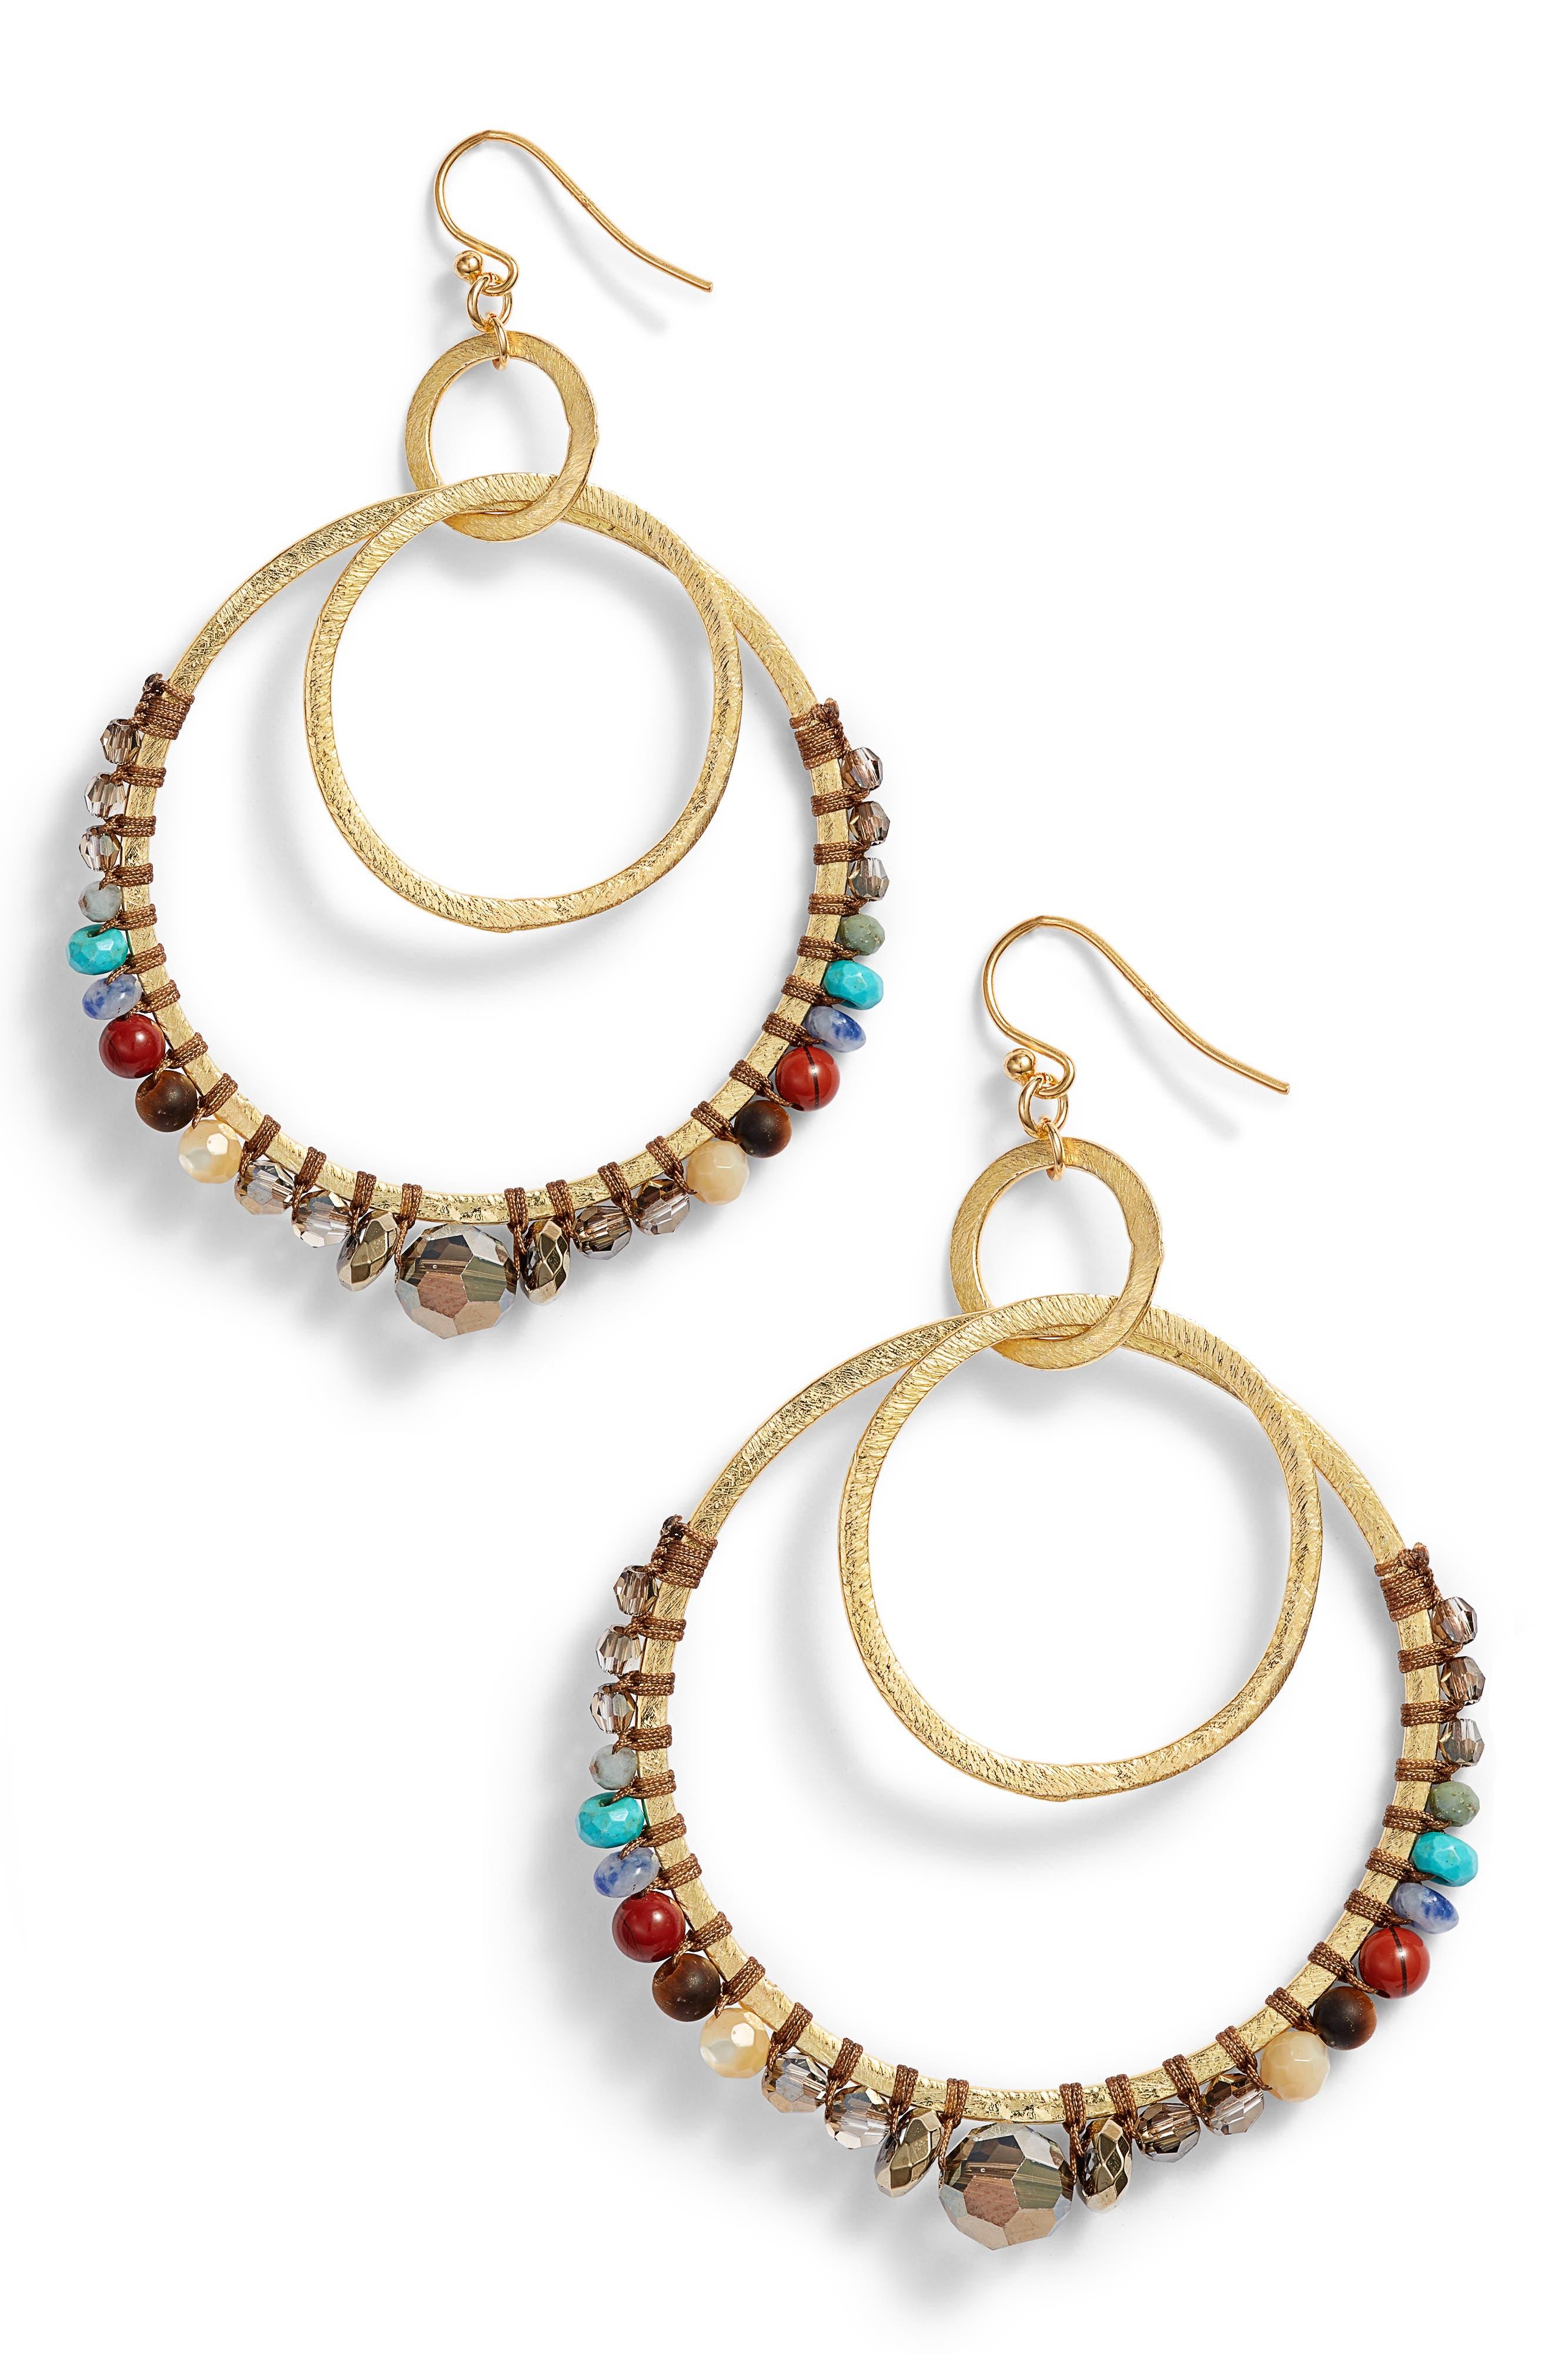 Beaded Double Hoop Earrings,                         Main,                         color, BEIGE MULTI MIX